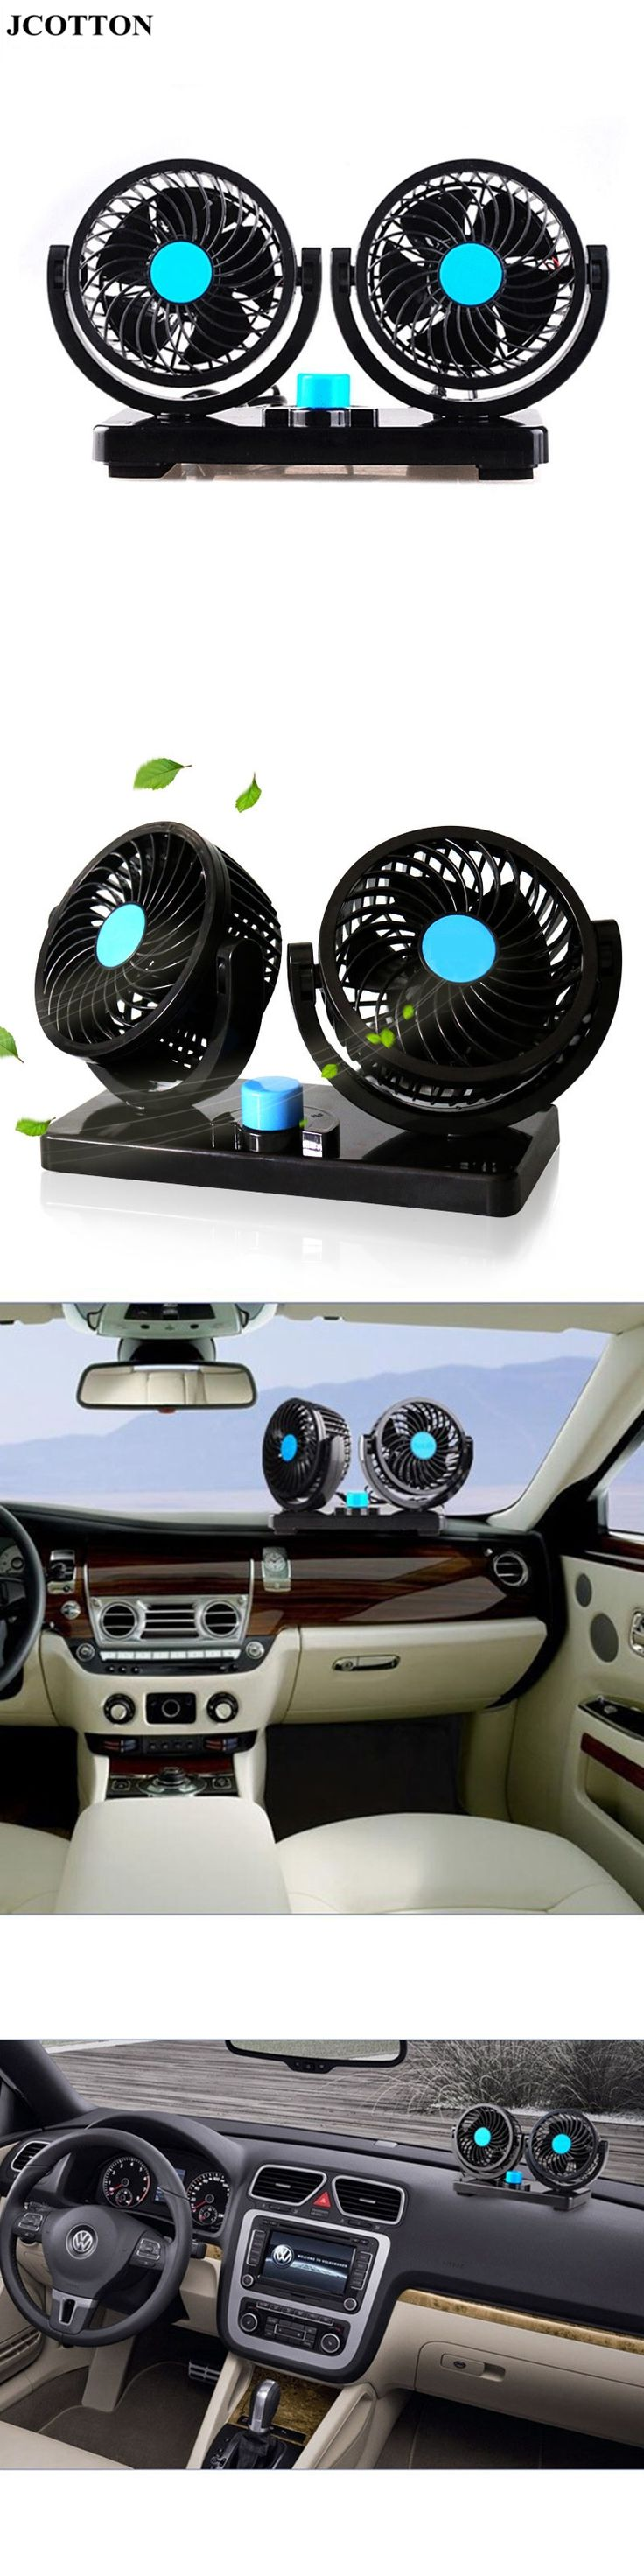 103 best car electronics images on pinterest